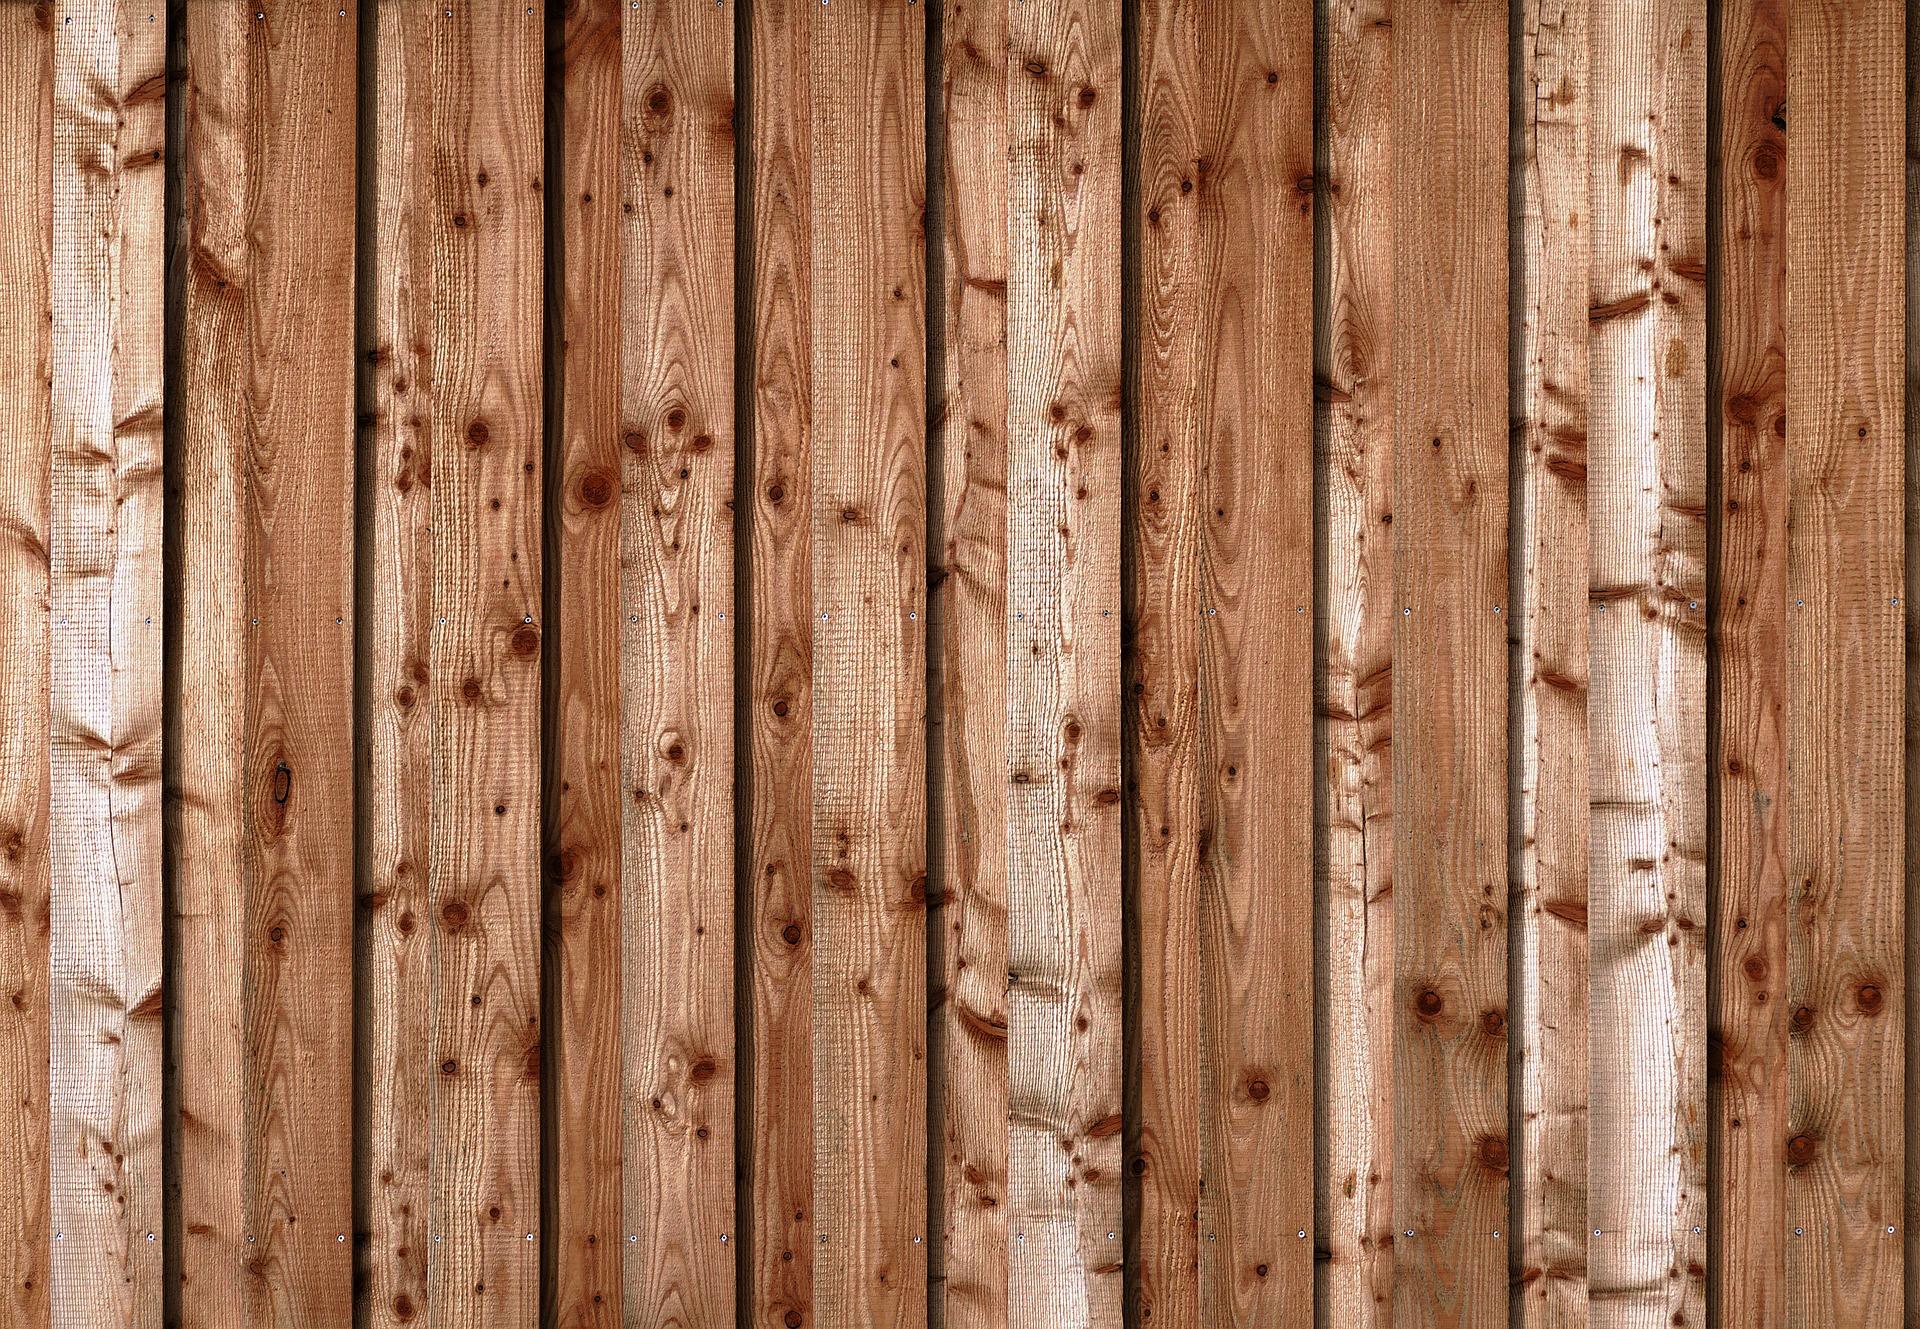 fence contractor deck builder little rock north little rock sherwood jacksvonille arkansas ar fences fencing decks decking contractor professional quality excellent customer service